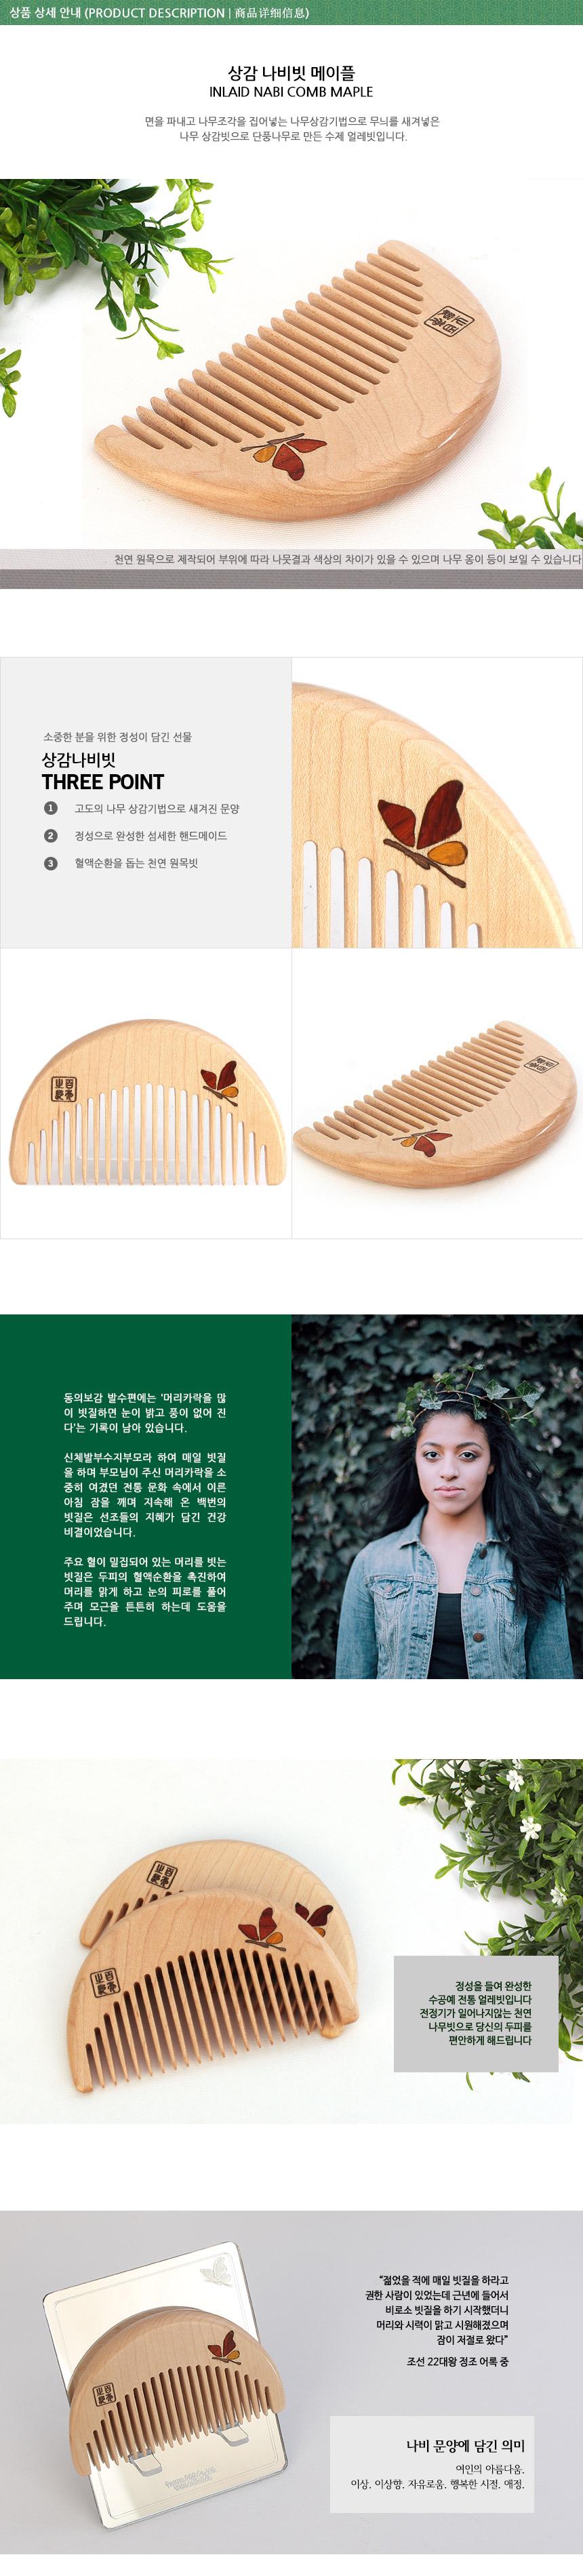 handmade comb